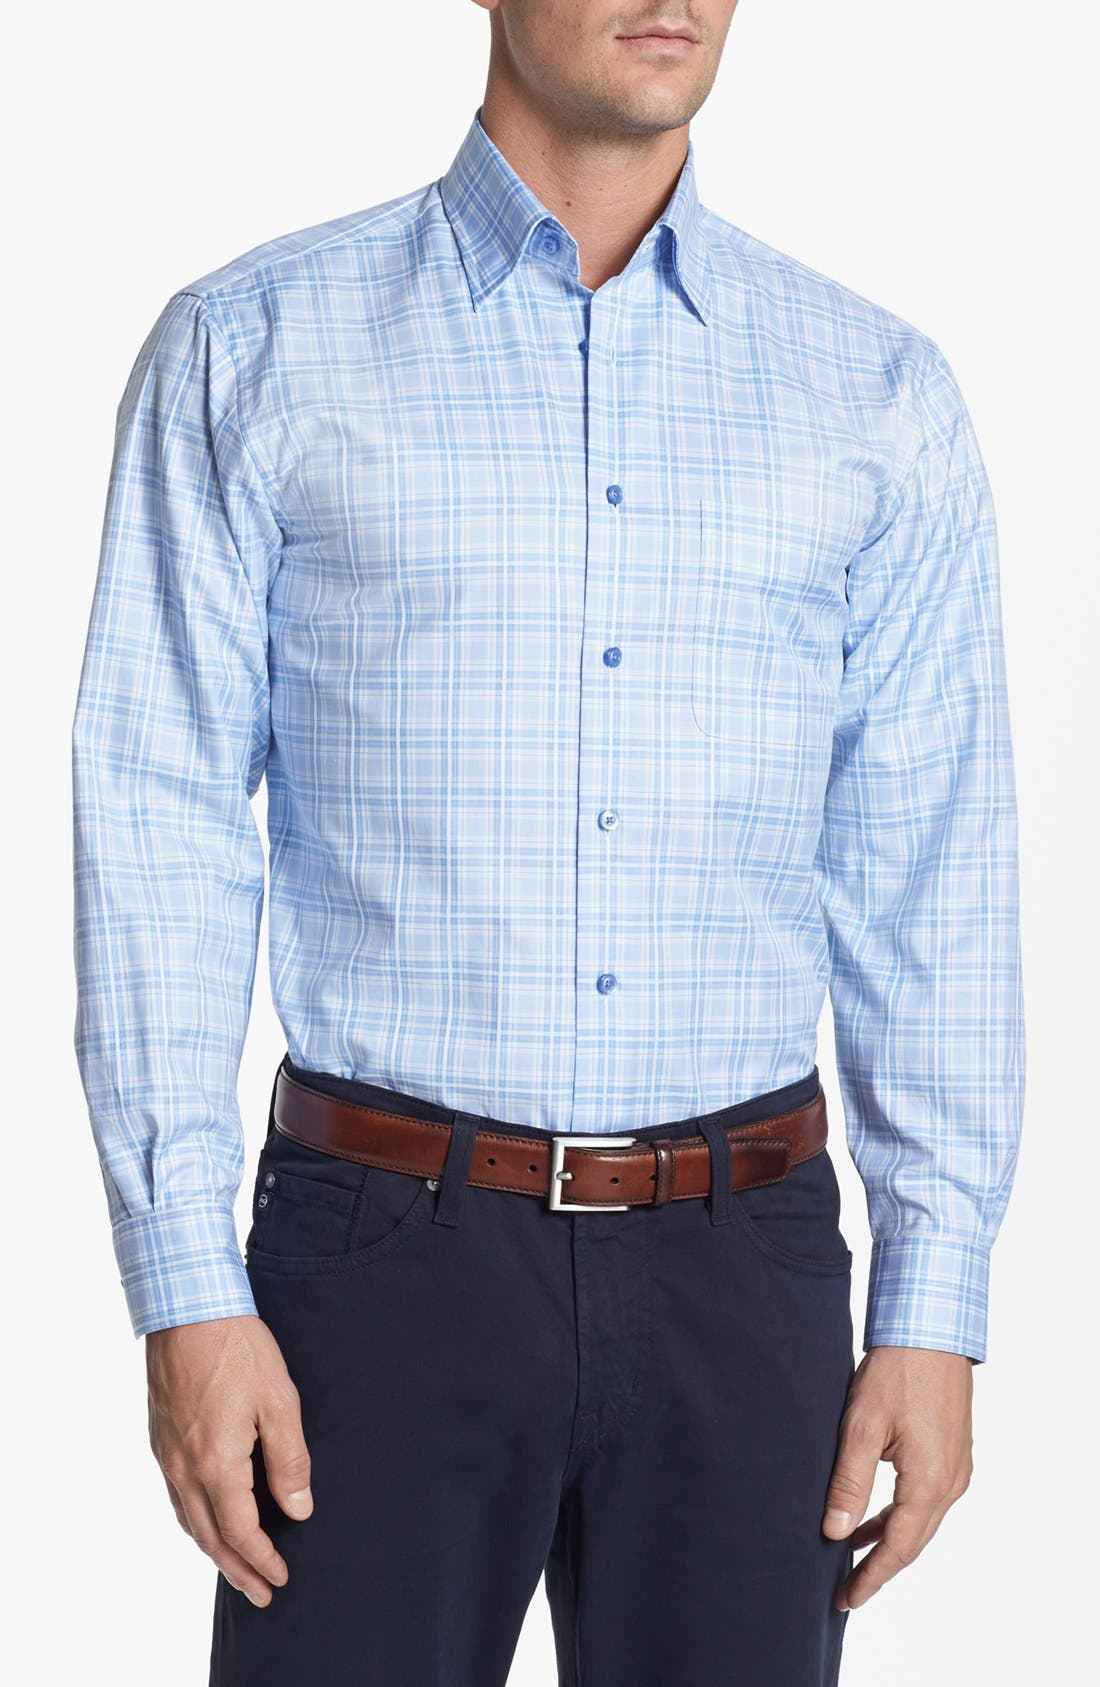 Main Image - Robert Talbott Sport Shirt